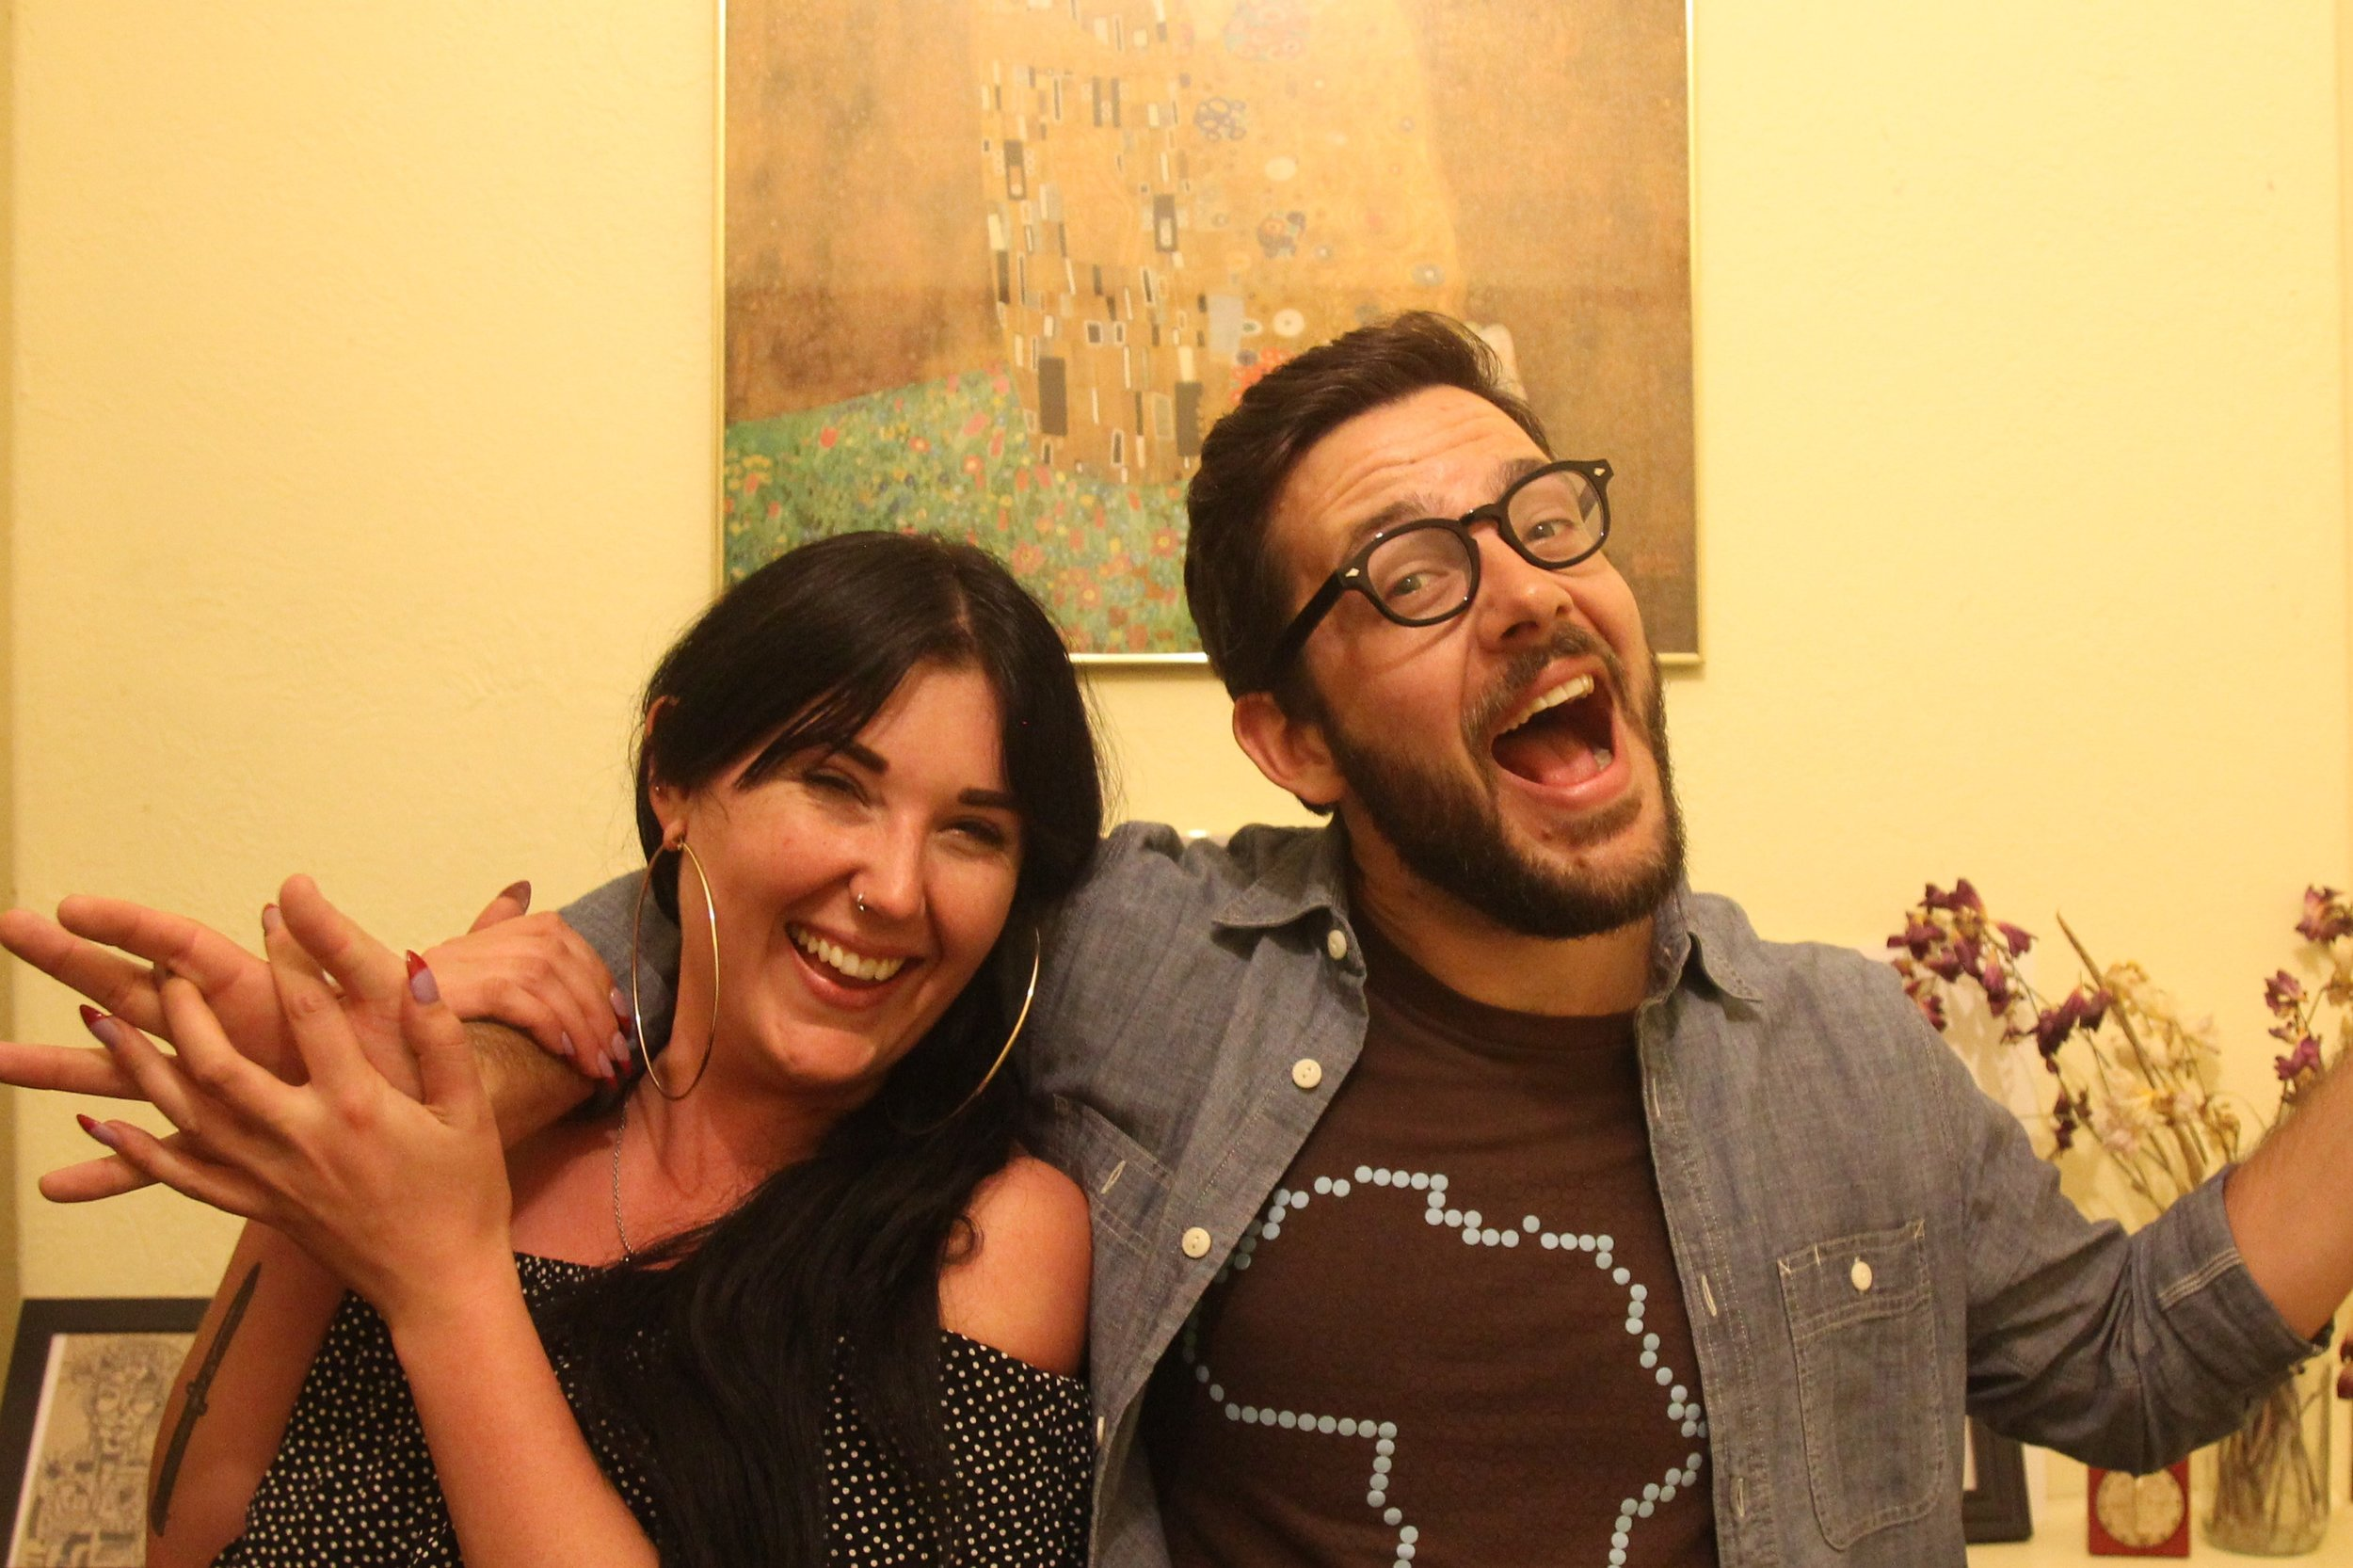 Caspar and Rose post-binge #millennials #getonboard #grassrootsactivism